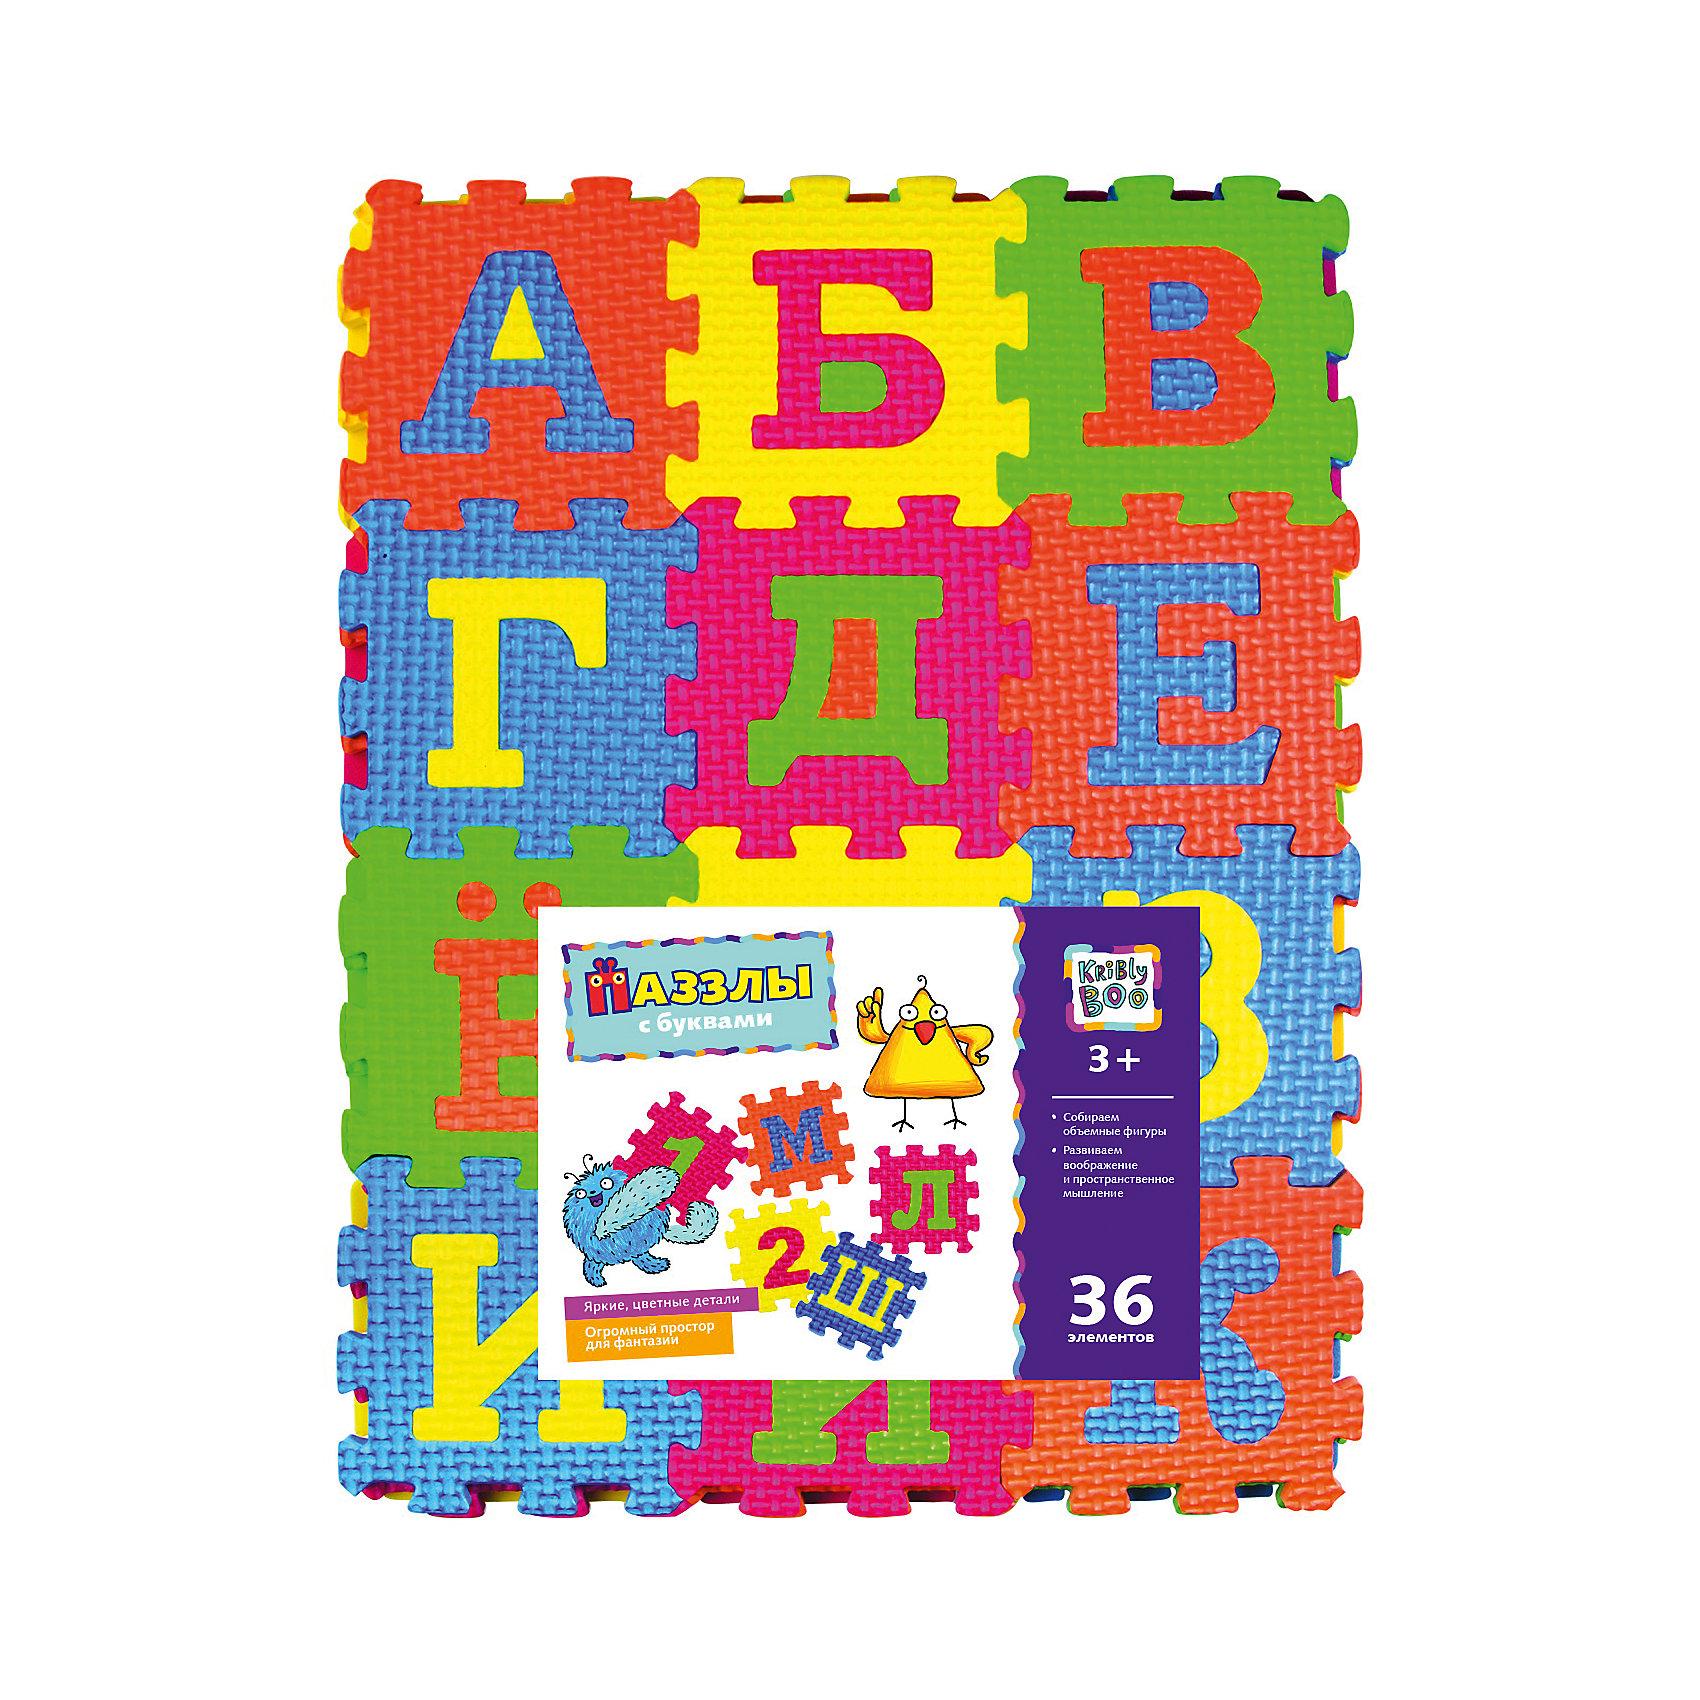 Kribly Boo Пазлы с буквами, 36 элементов пазлы origami пазл дм зайчик и волчонок 25 элементов